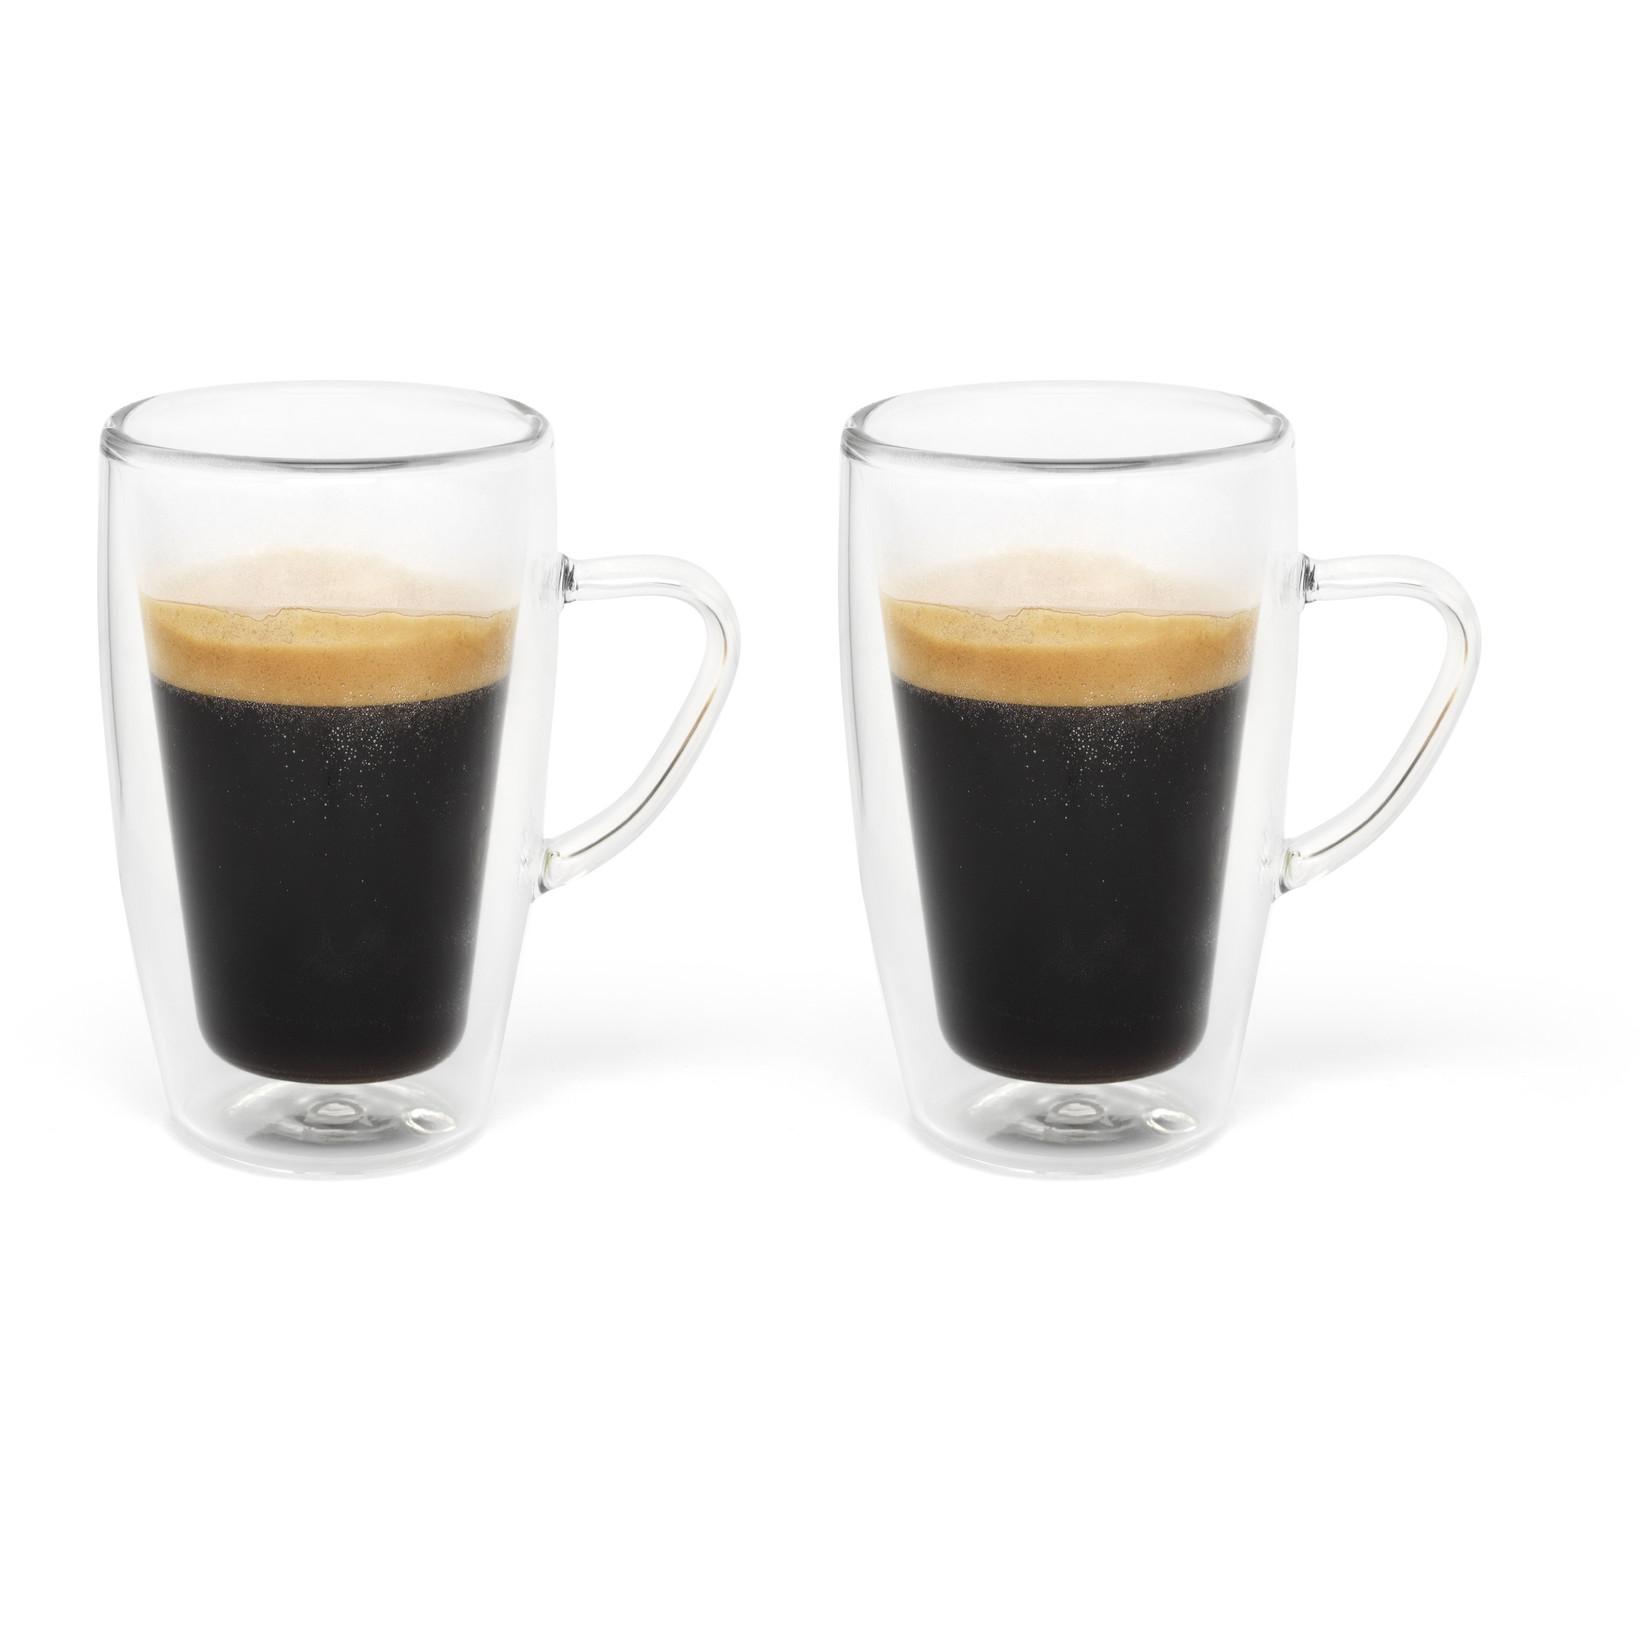 Bredemeijer Bredemeijer Duo drinkglas Set 2 Dubbelwandig Espresso glas 100ml